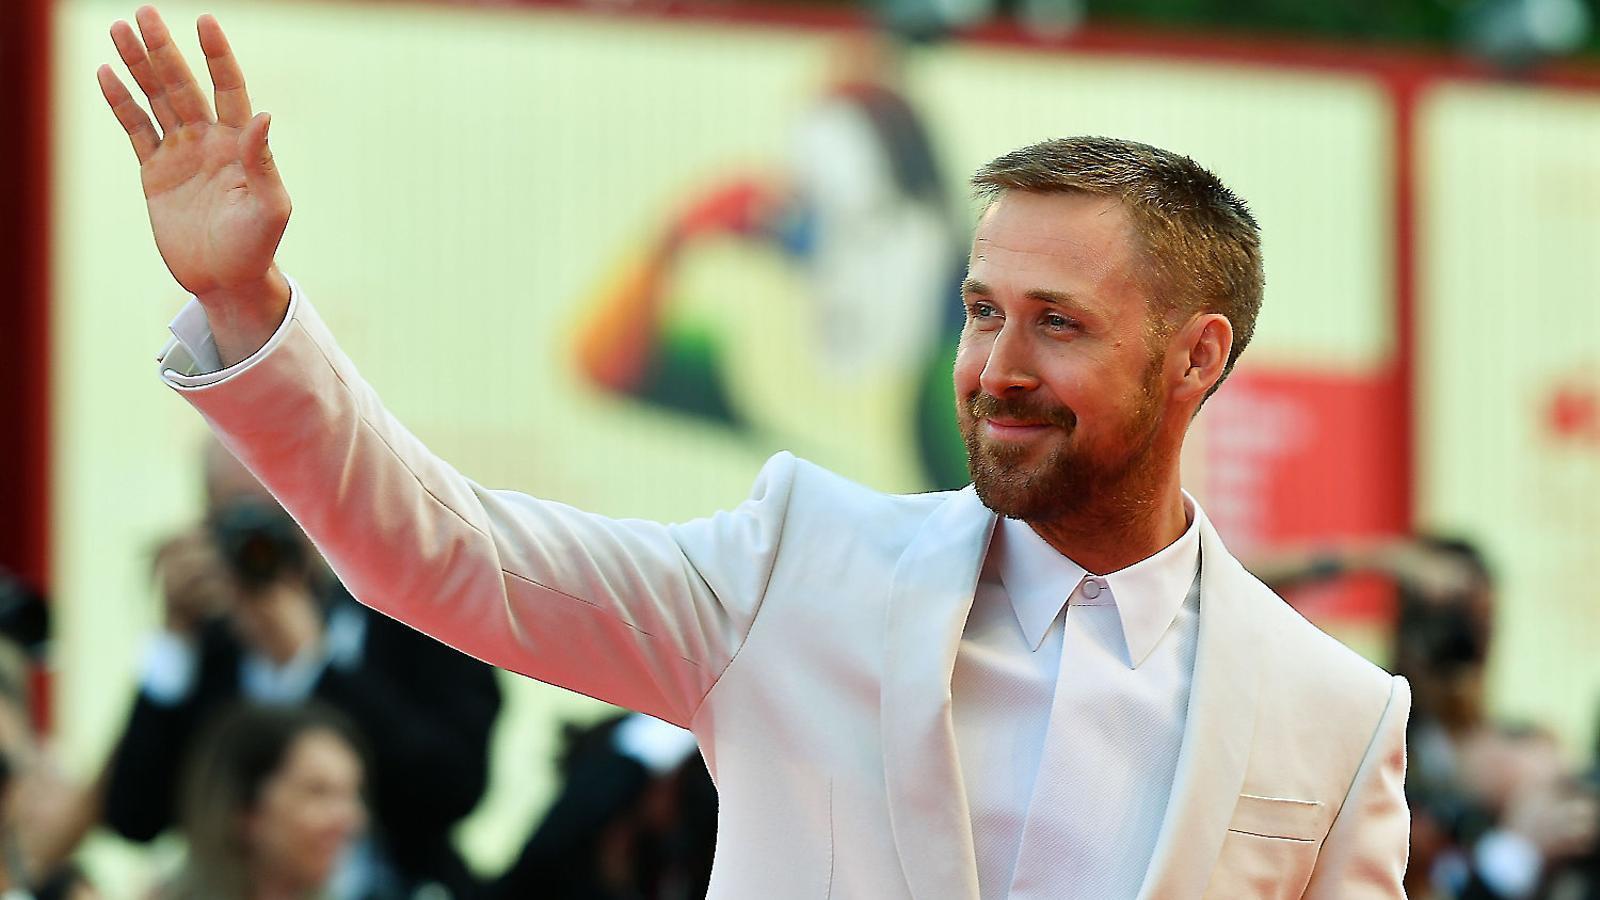 Ryan Gosling viatja a la Lluna amb Damien Chazelle